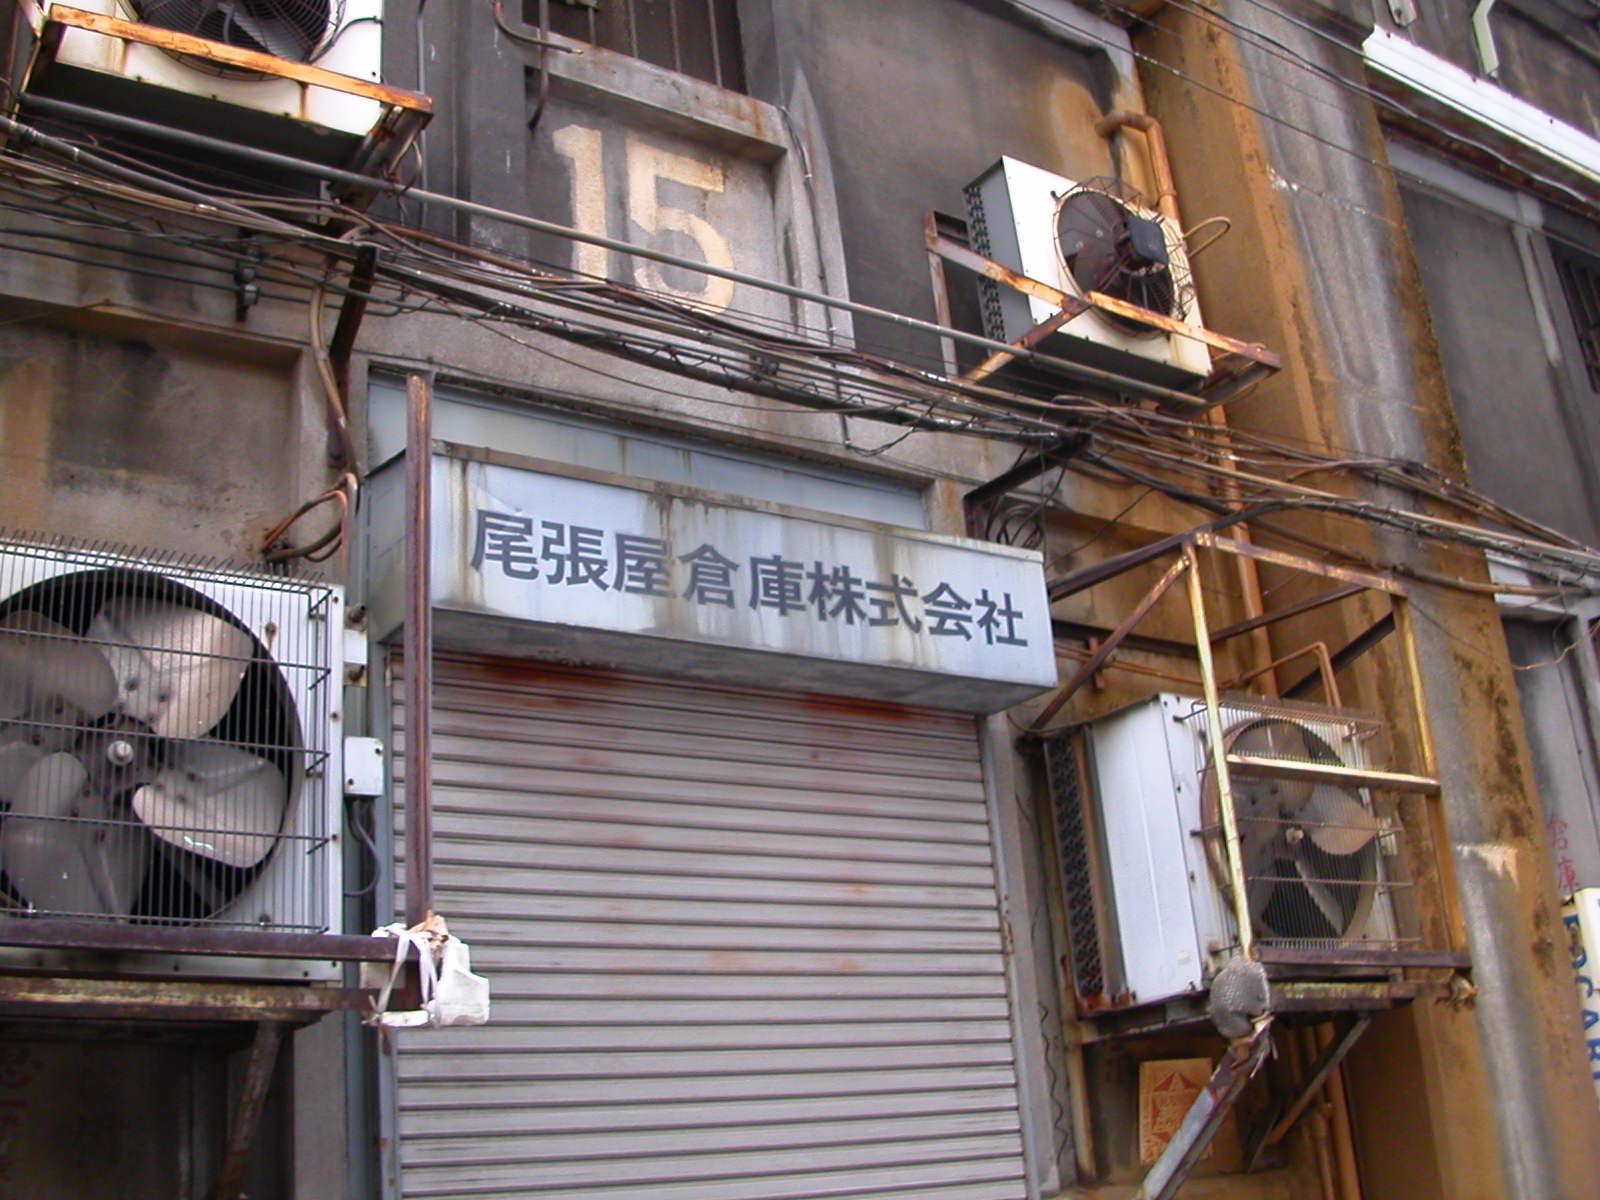 Rotors -- Under the Yamanote Line near Akihabara